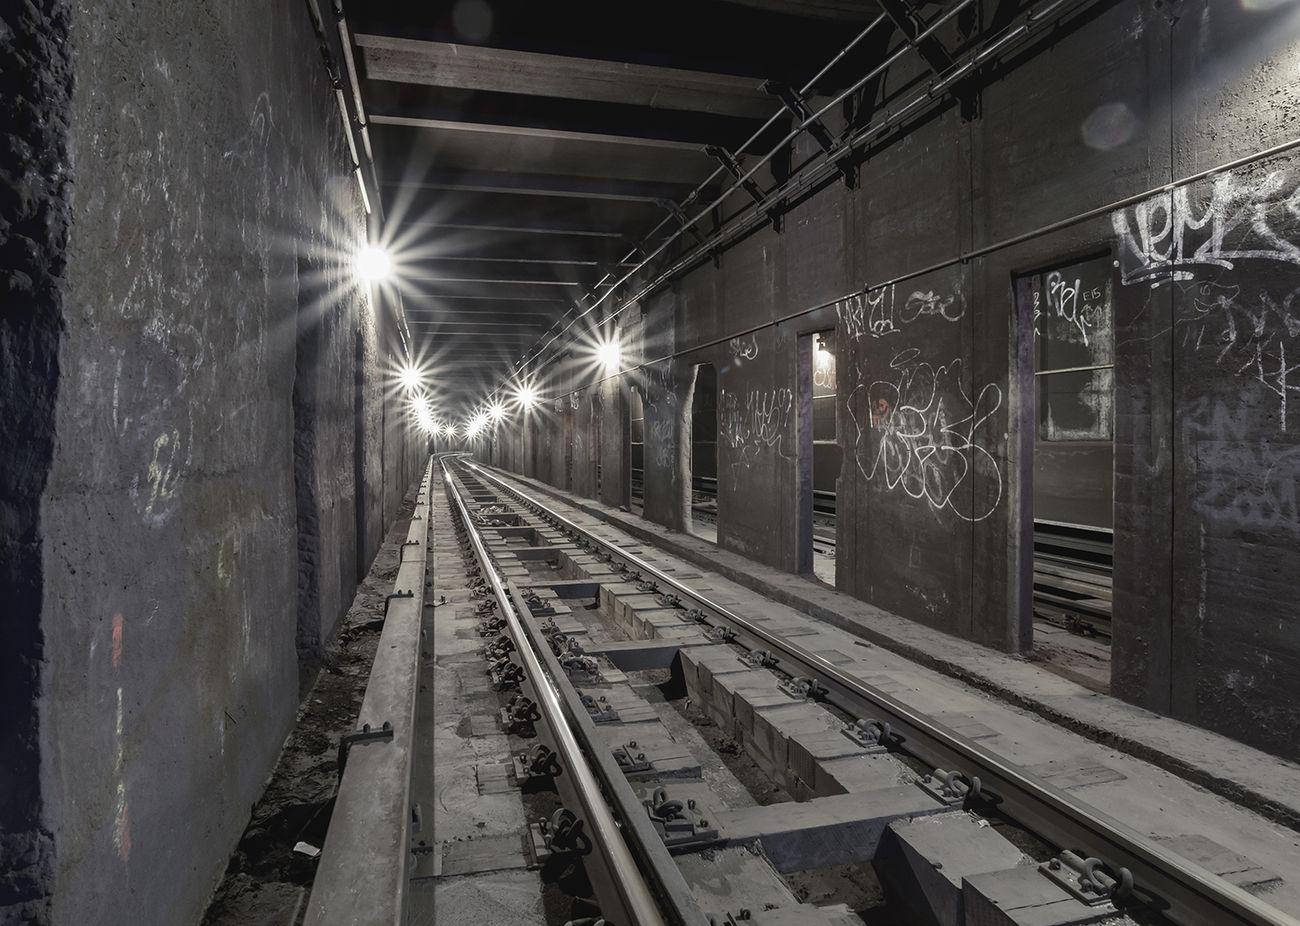 Cluster The Moment - 2015 EyeEm Awards EyeEm EyeEm Best Shots New York New York City ExploreEverything Notes From The Underground AEBEX